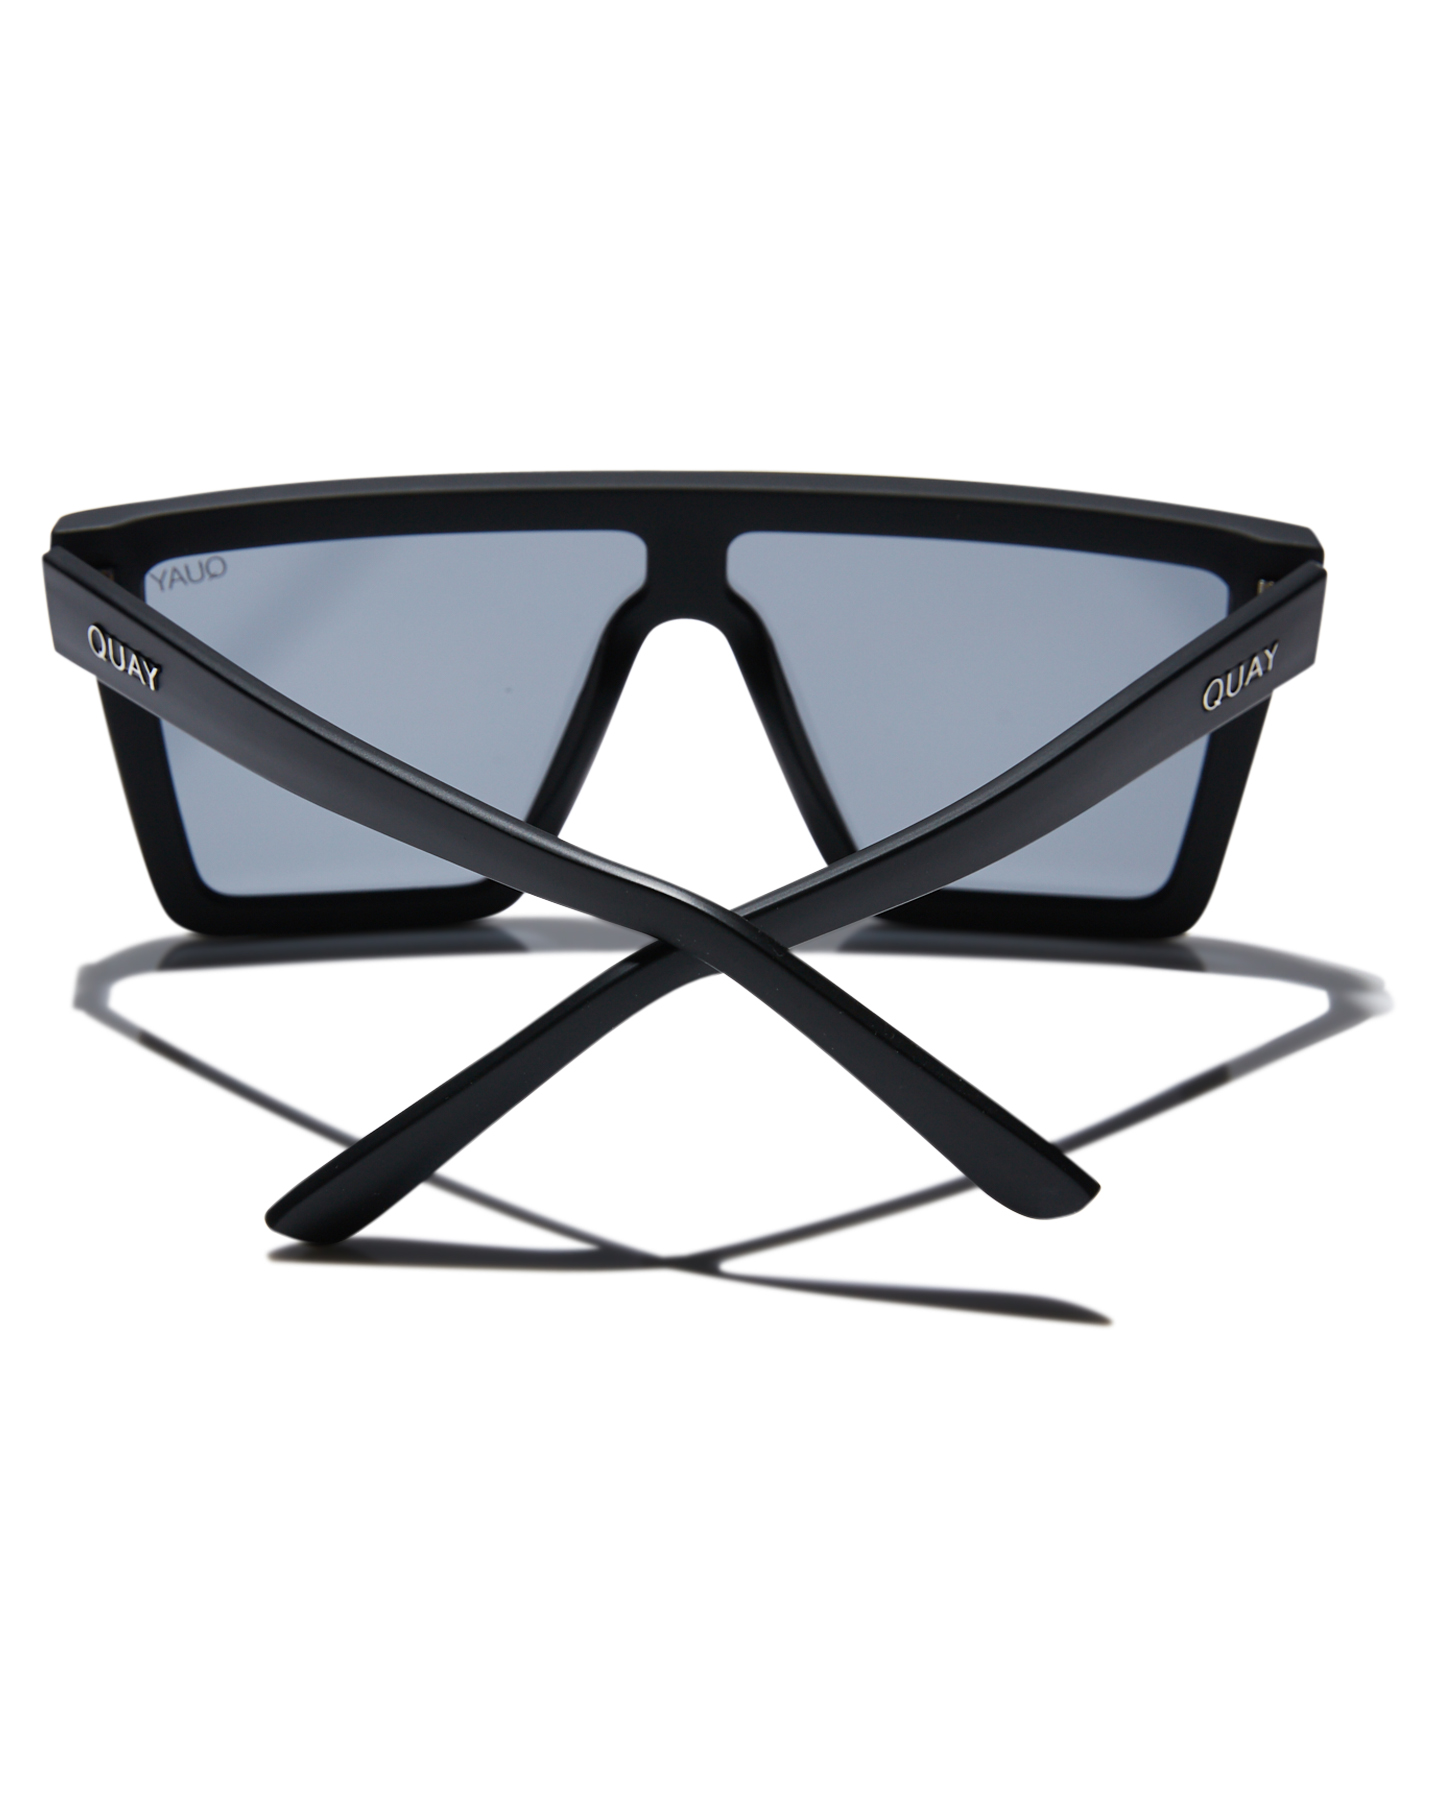 New-Quay-Eyewear-Women-039-s-Hindsight-Sunglasses-Stainless-Steel-Glass-Pink thumbnail 19